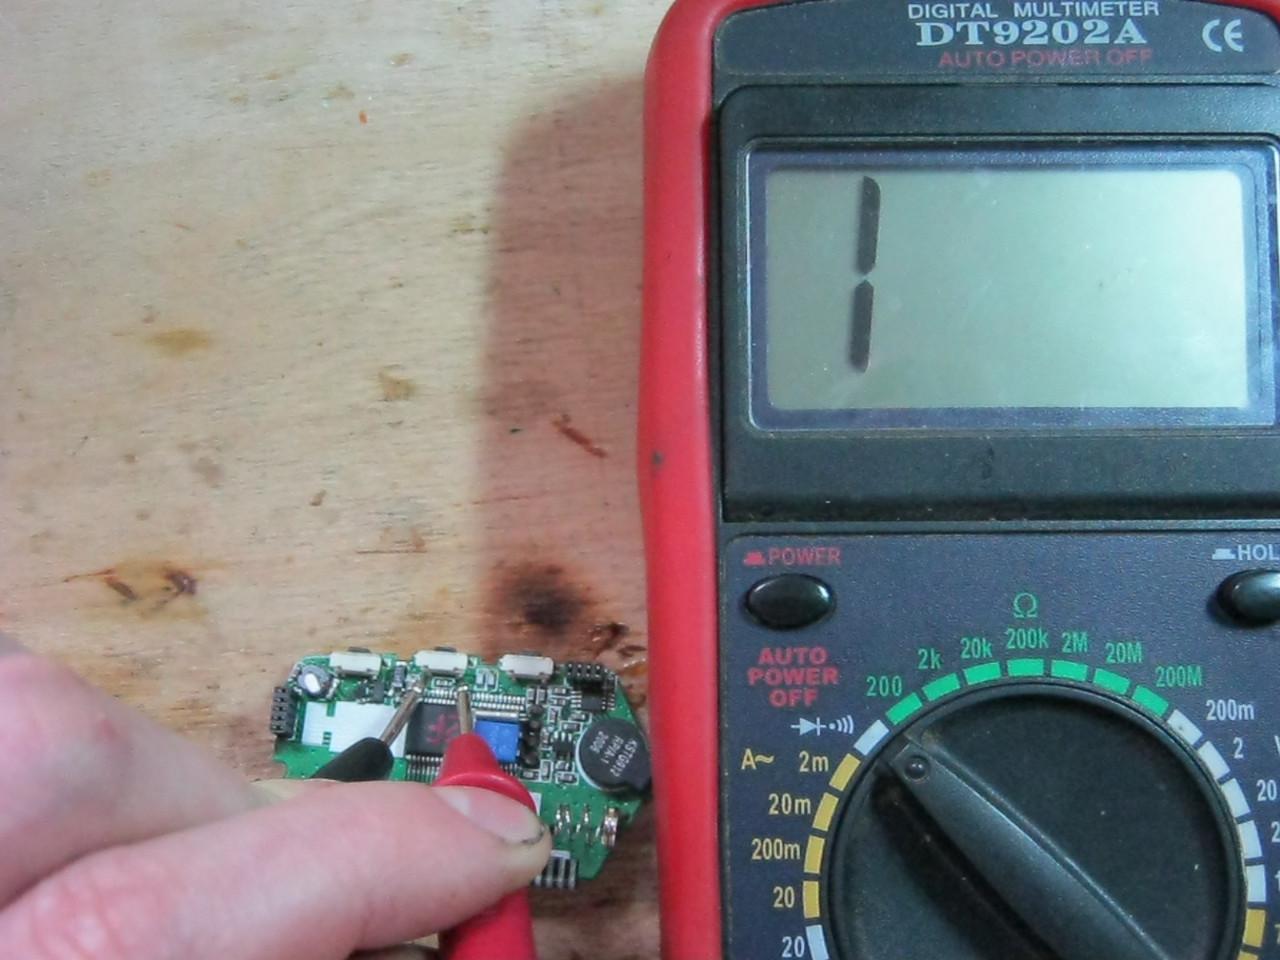 ремонт брелка проверка кнопок